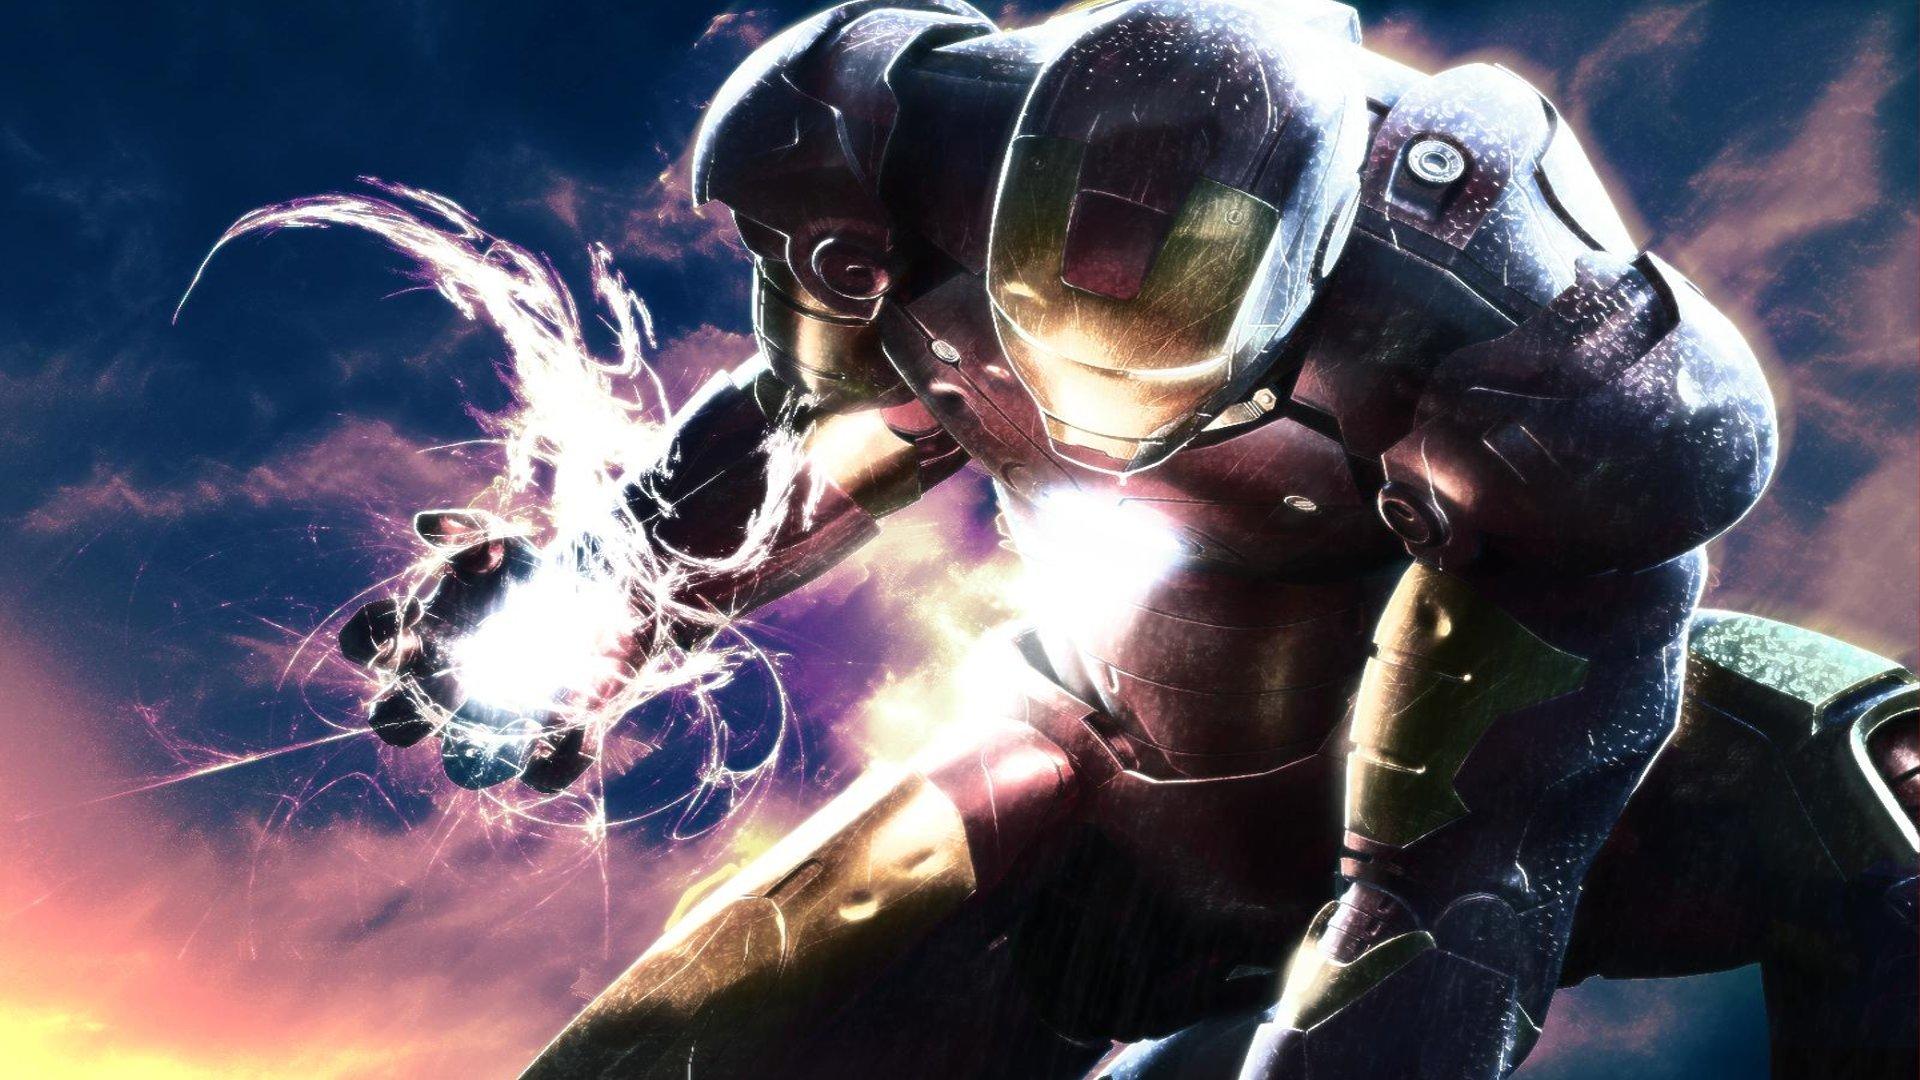 Iron Man HD Wallpaper 1920x1080